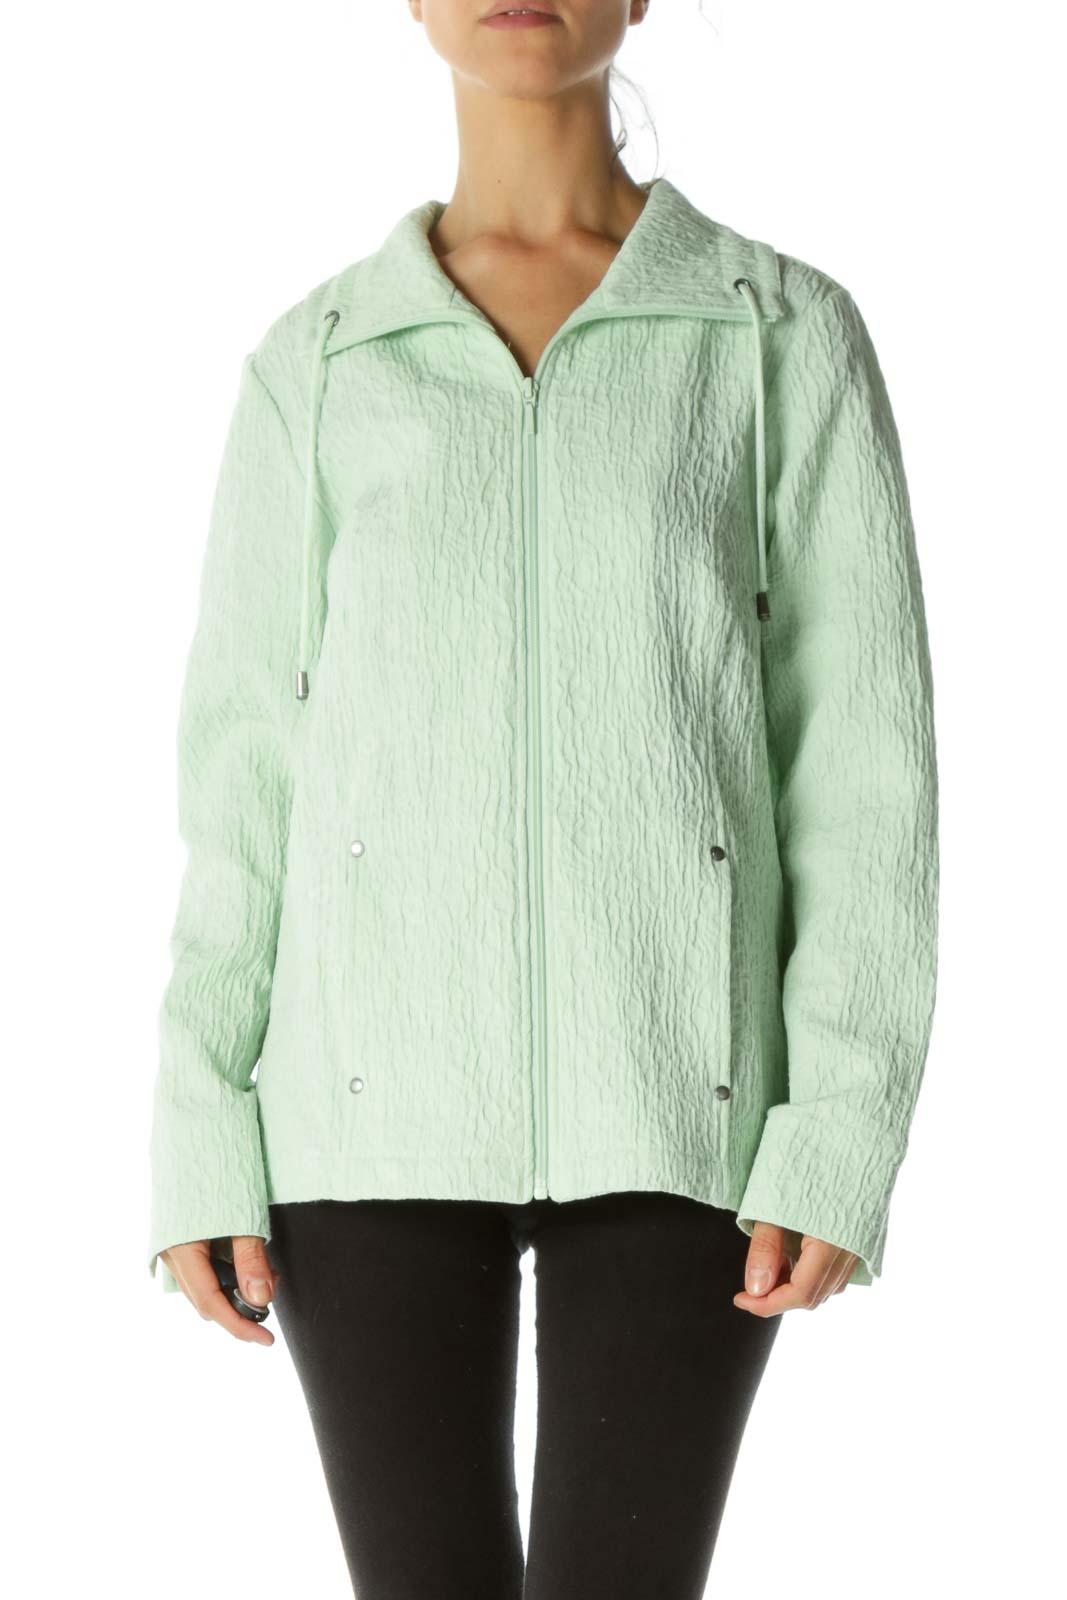 Mint Green Jacquard Drawstring Zippered Pocketed Jacket Front